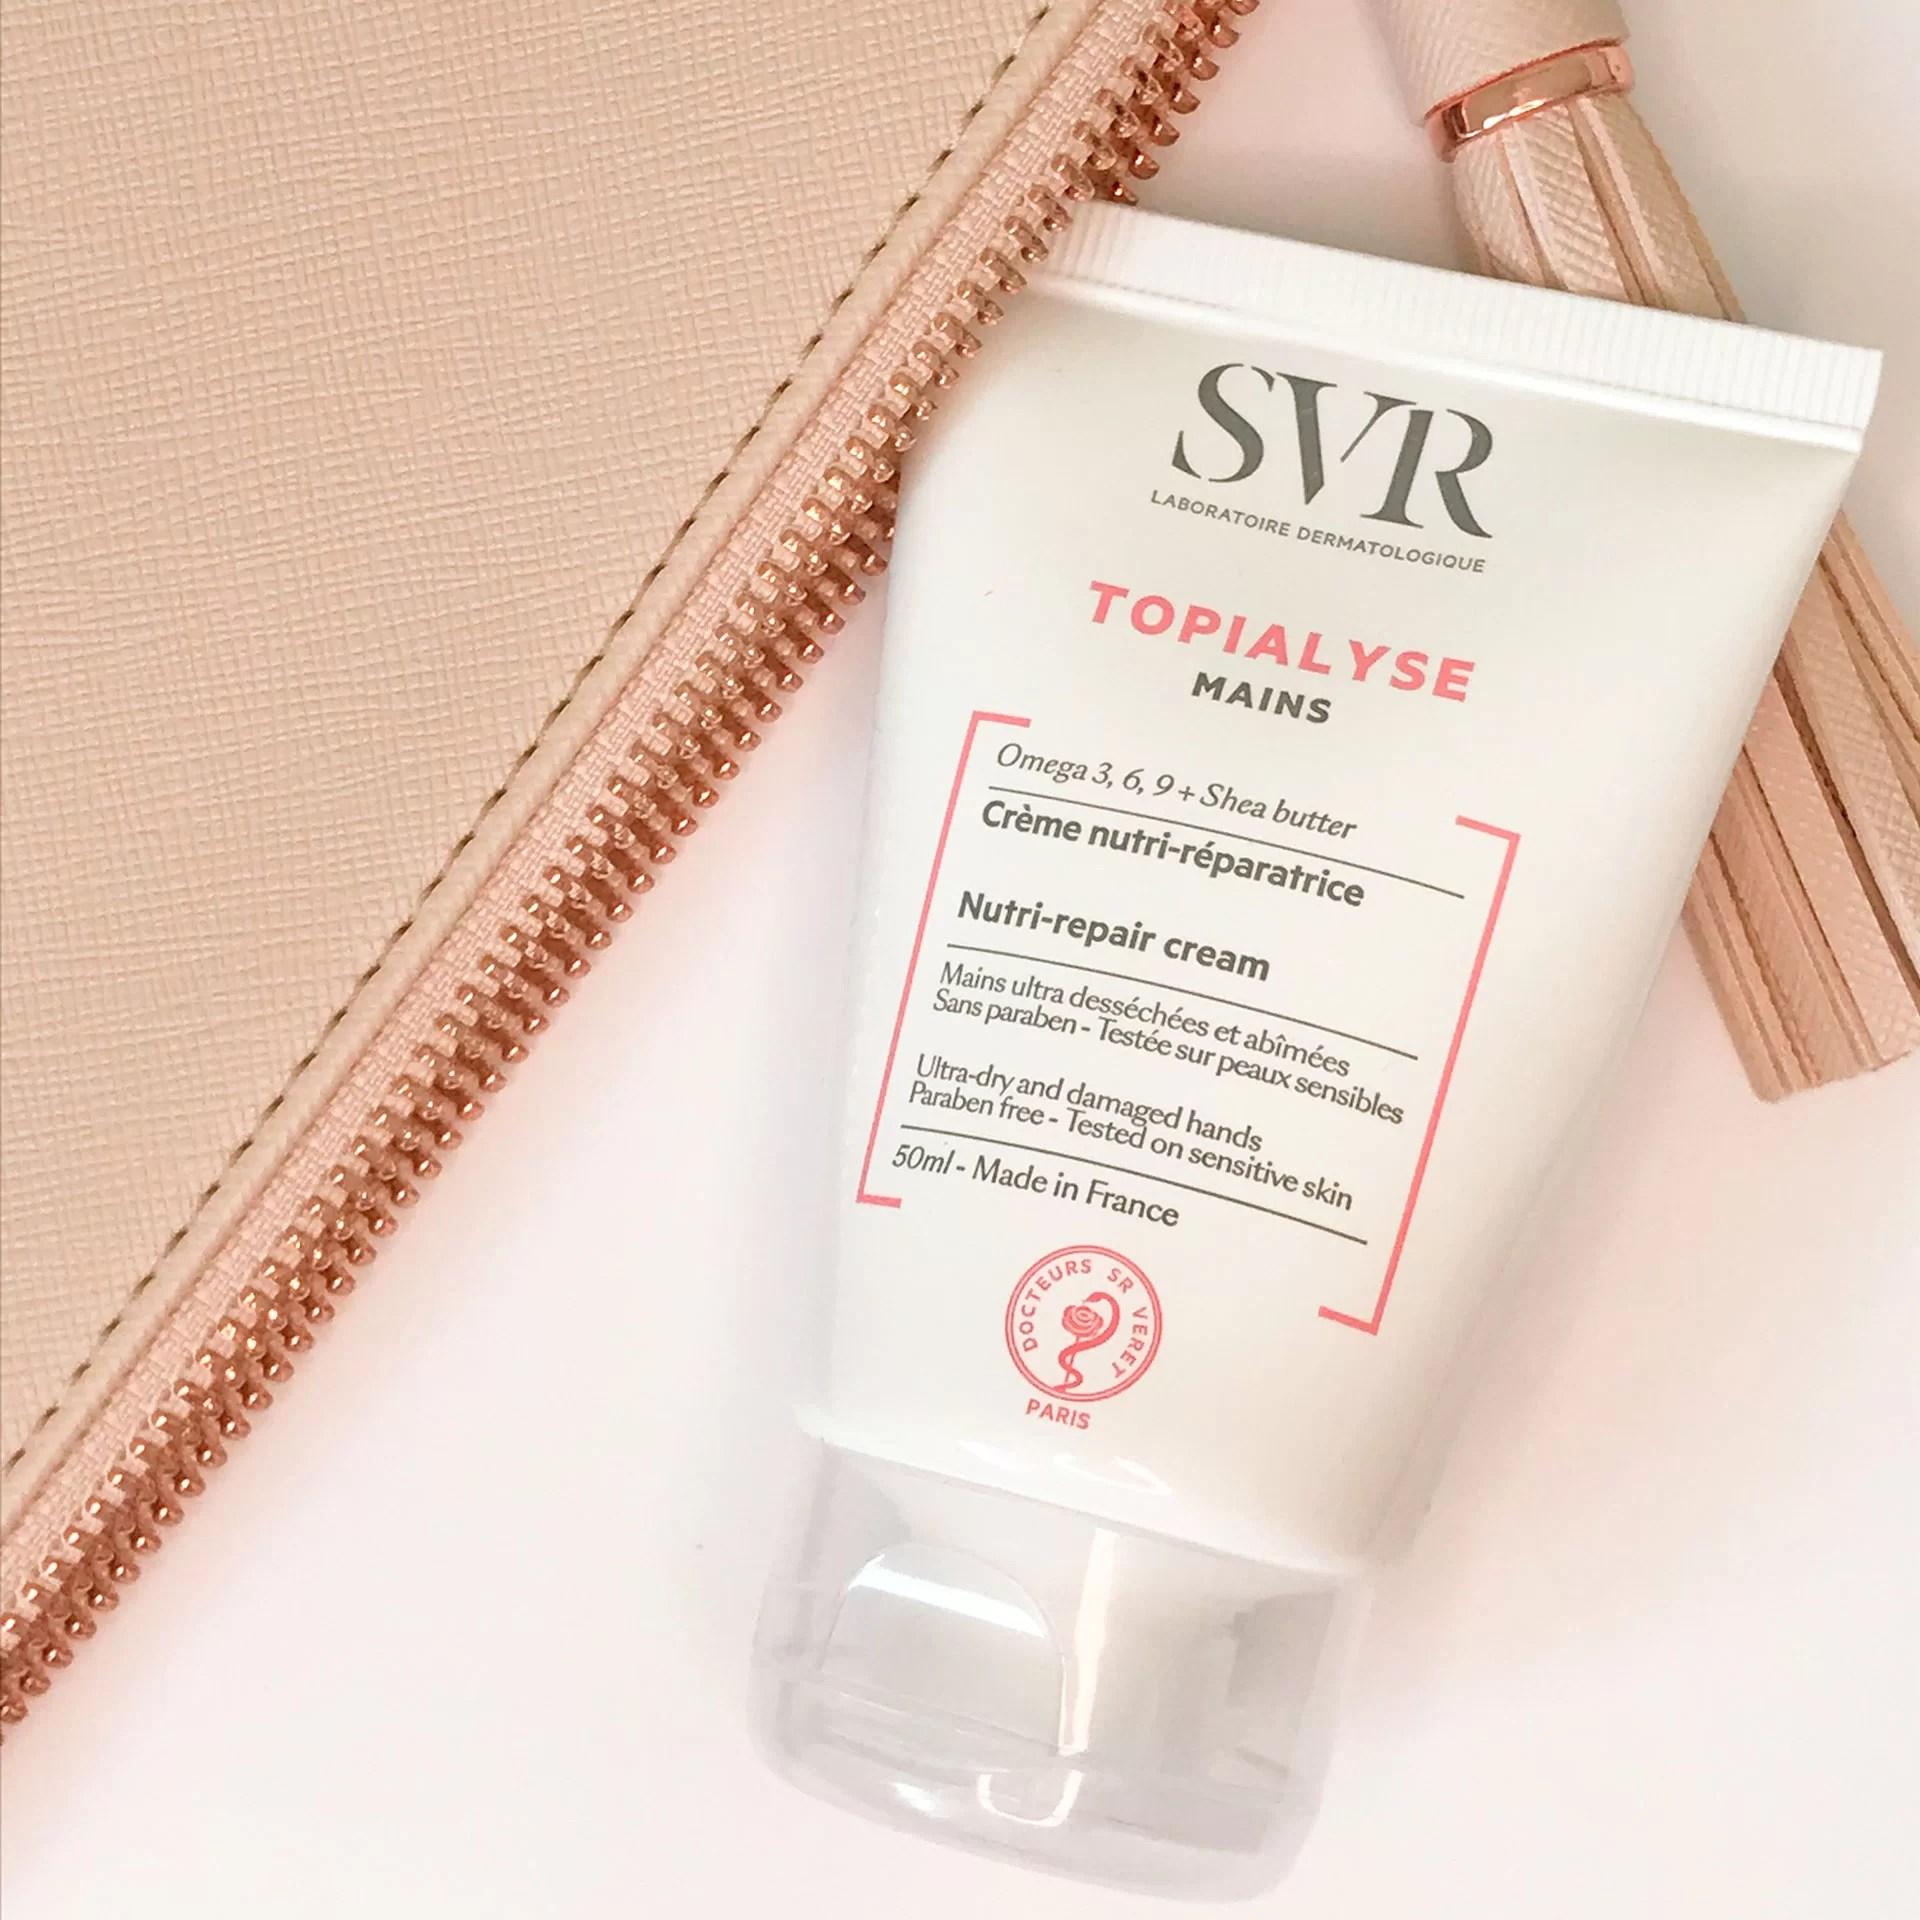 Sanitizer dryness saviour: review of SVR Topialyse mains